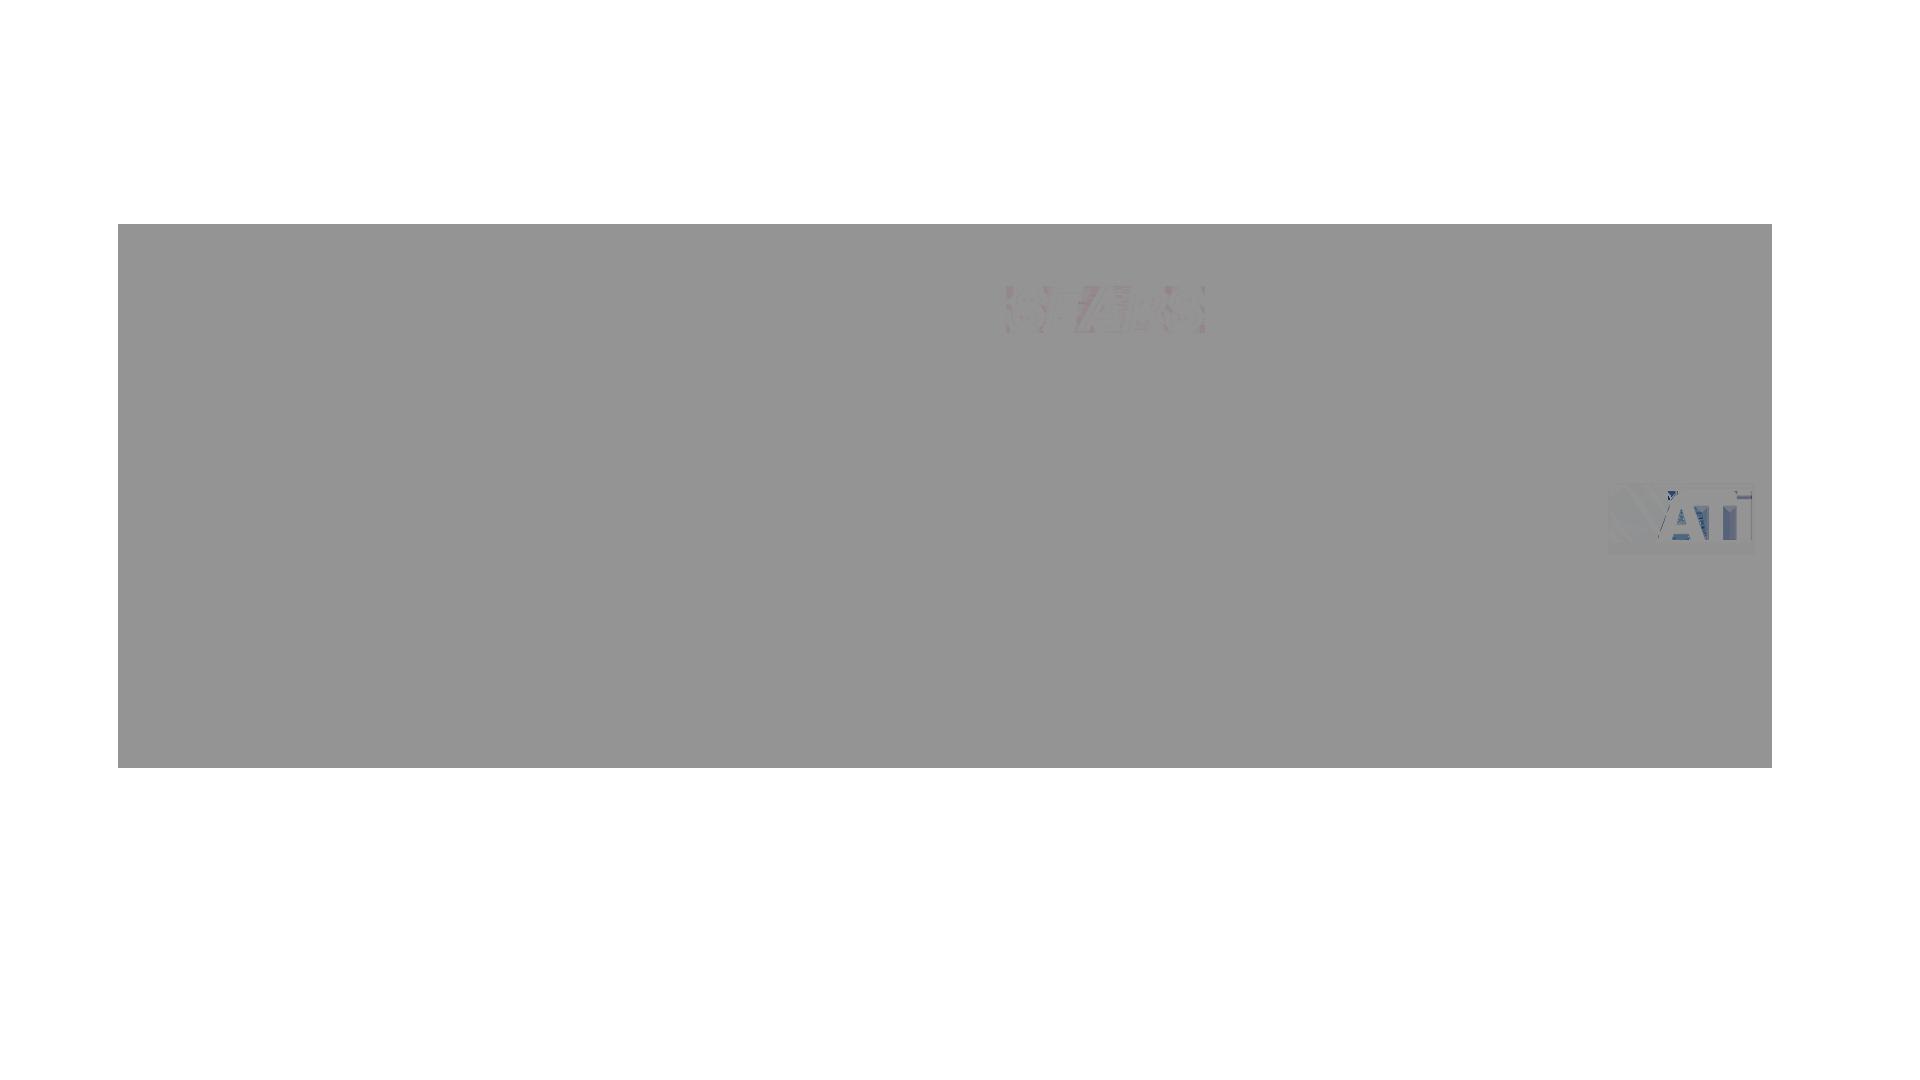 BRICK Logotipos clientes gris